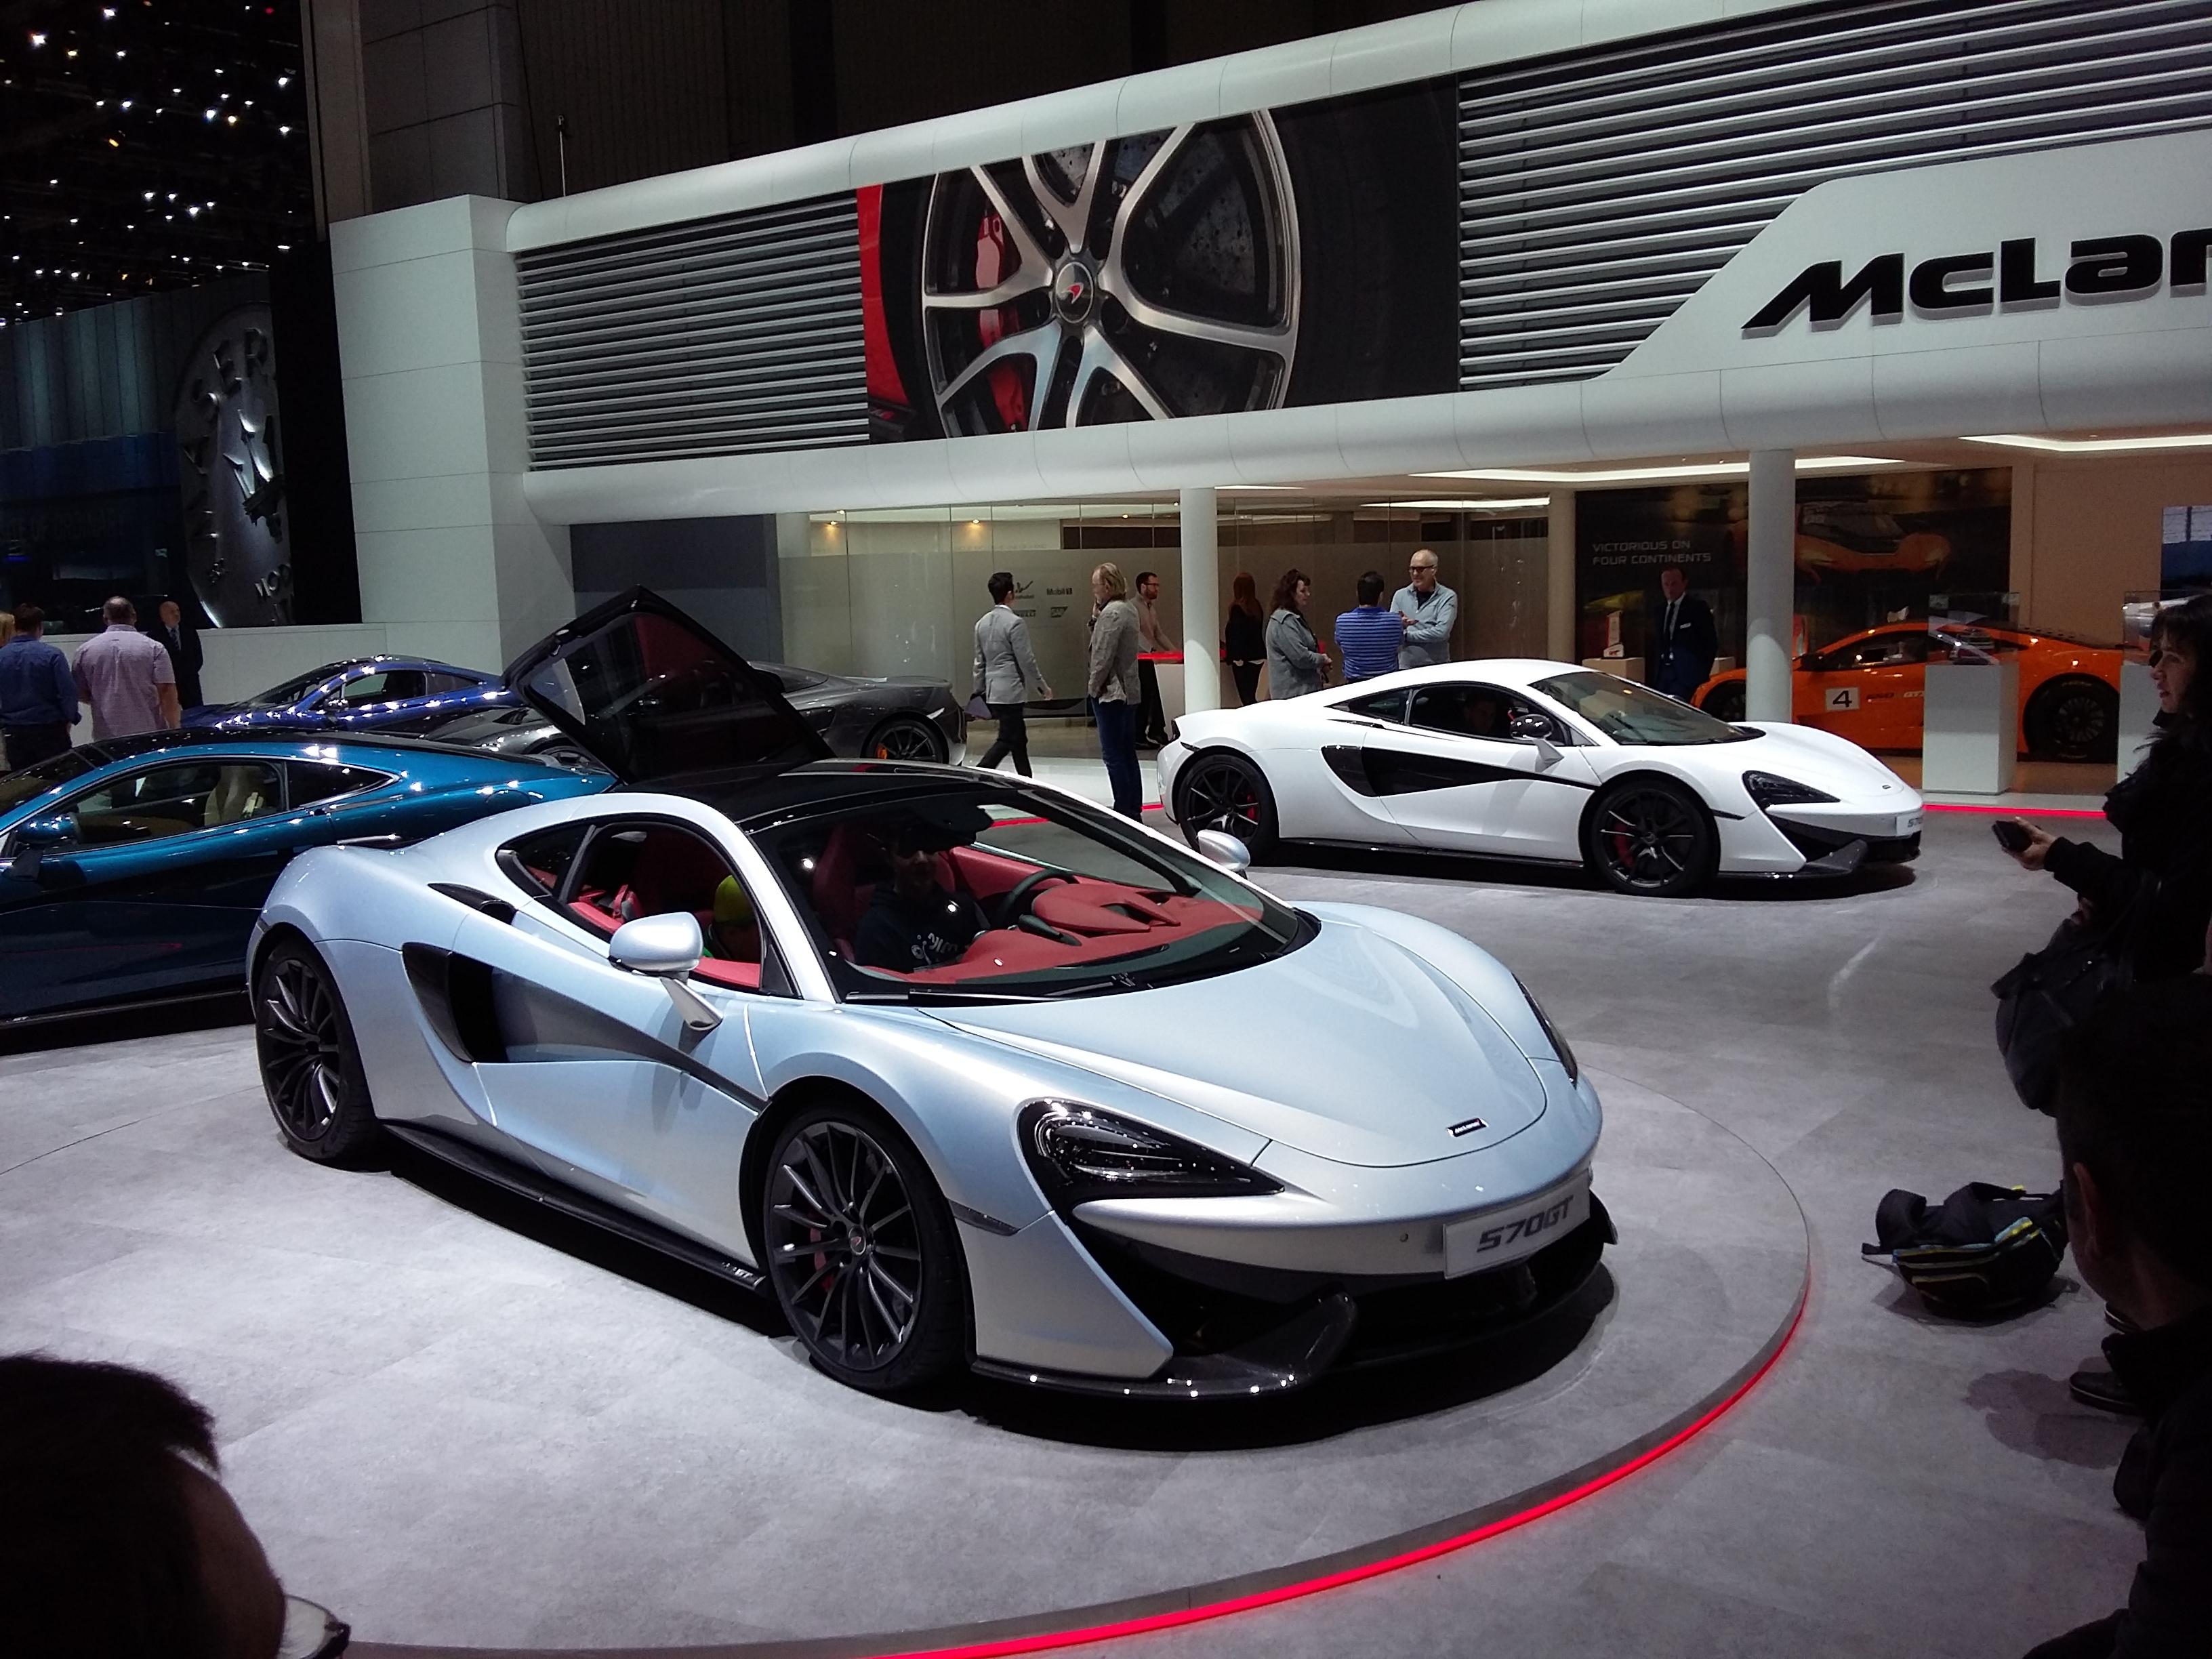 McLaren 570 GT Geneva Expo